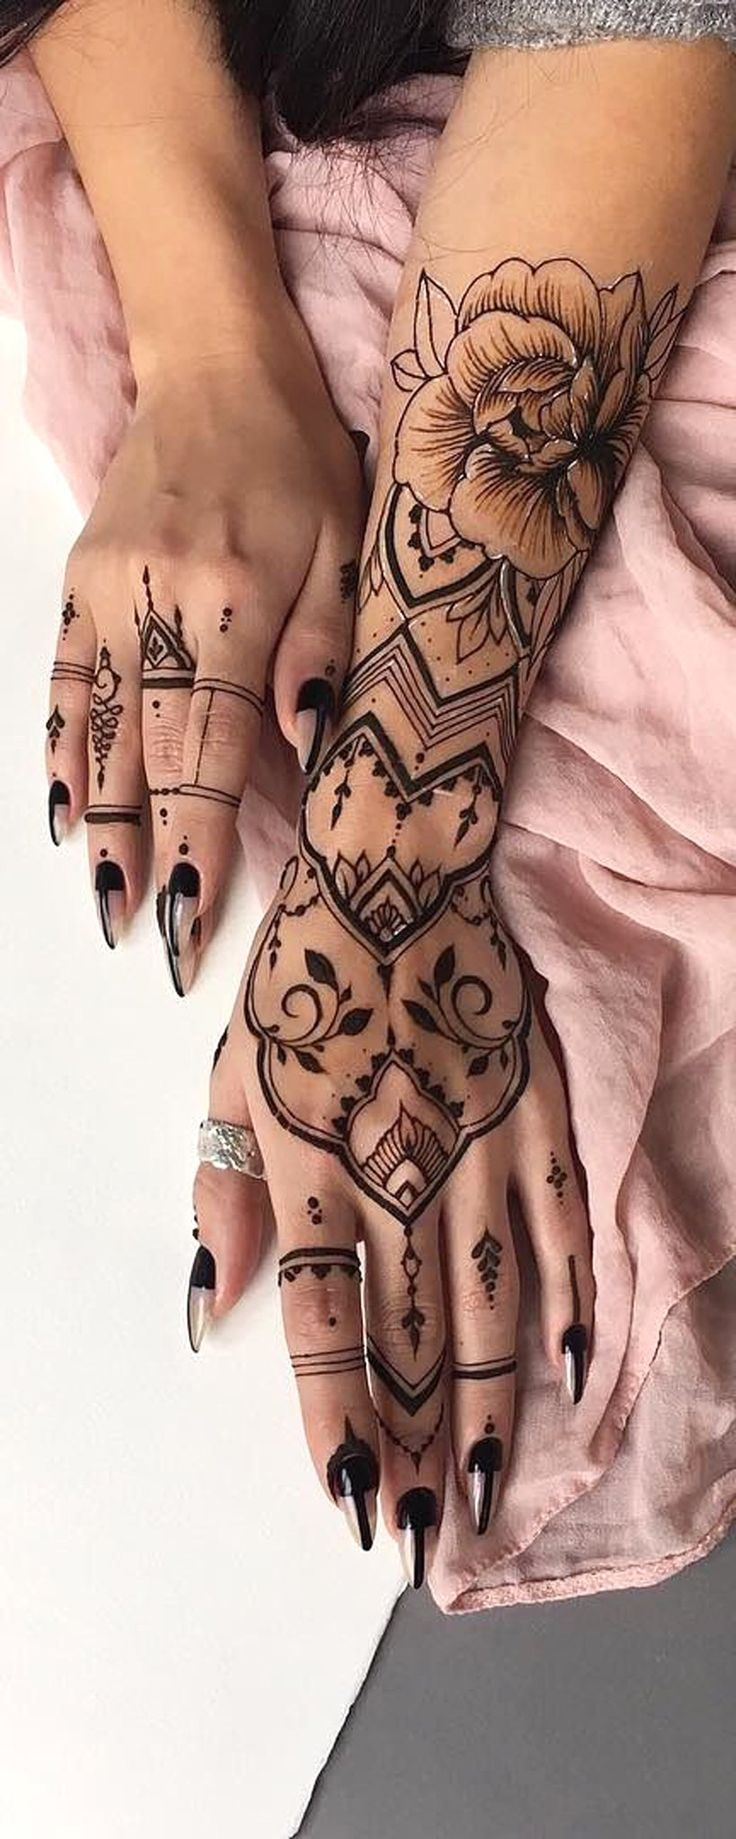 Black Henna Tribal Bohemian Hand Tattoo Ideas for Women - Realistic Rose Forearm Tat -  ideas de tatuaje de antebrazo rosa para mujeres - www.MyBodiArt.com